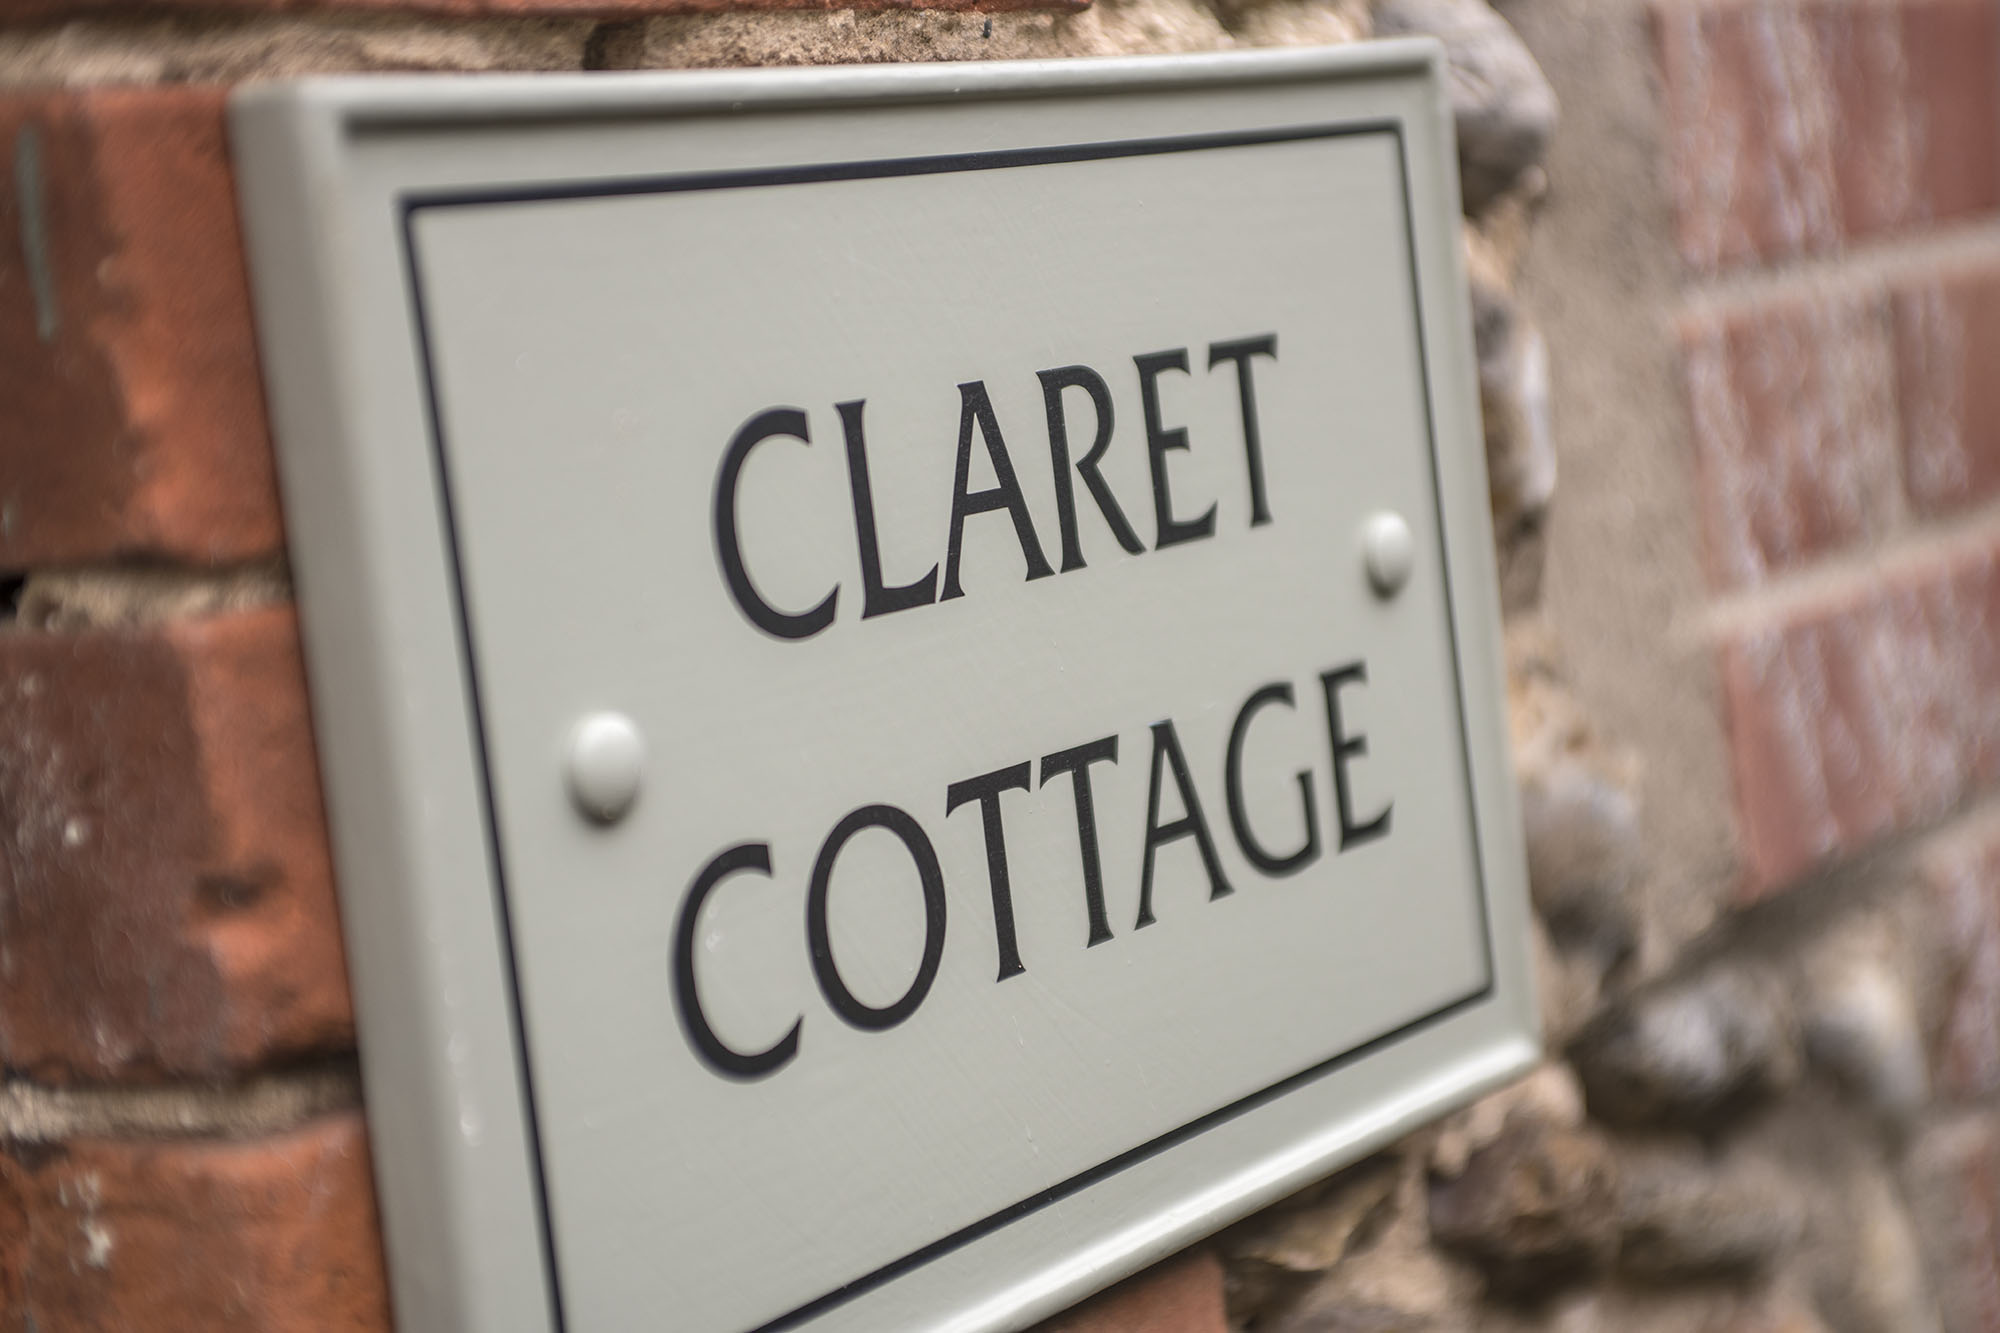 Claret Cottage